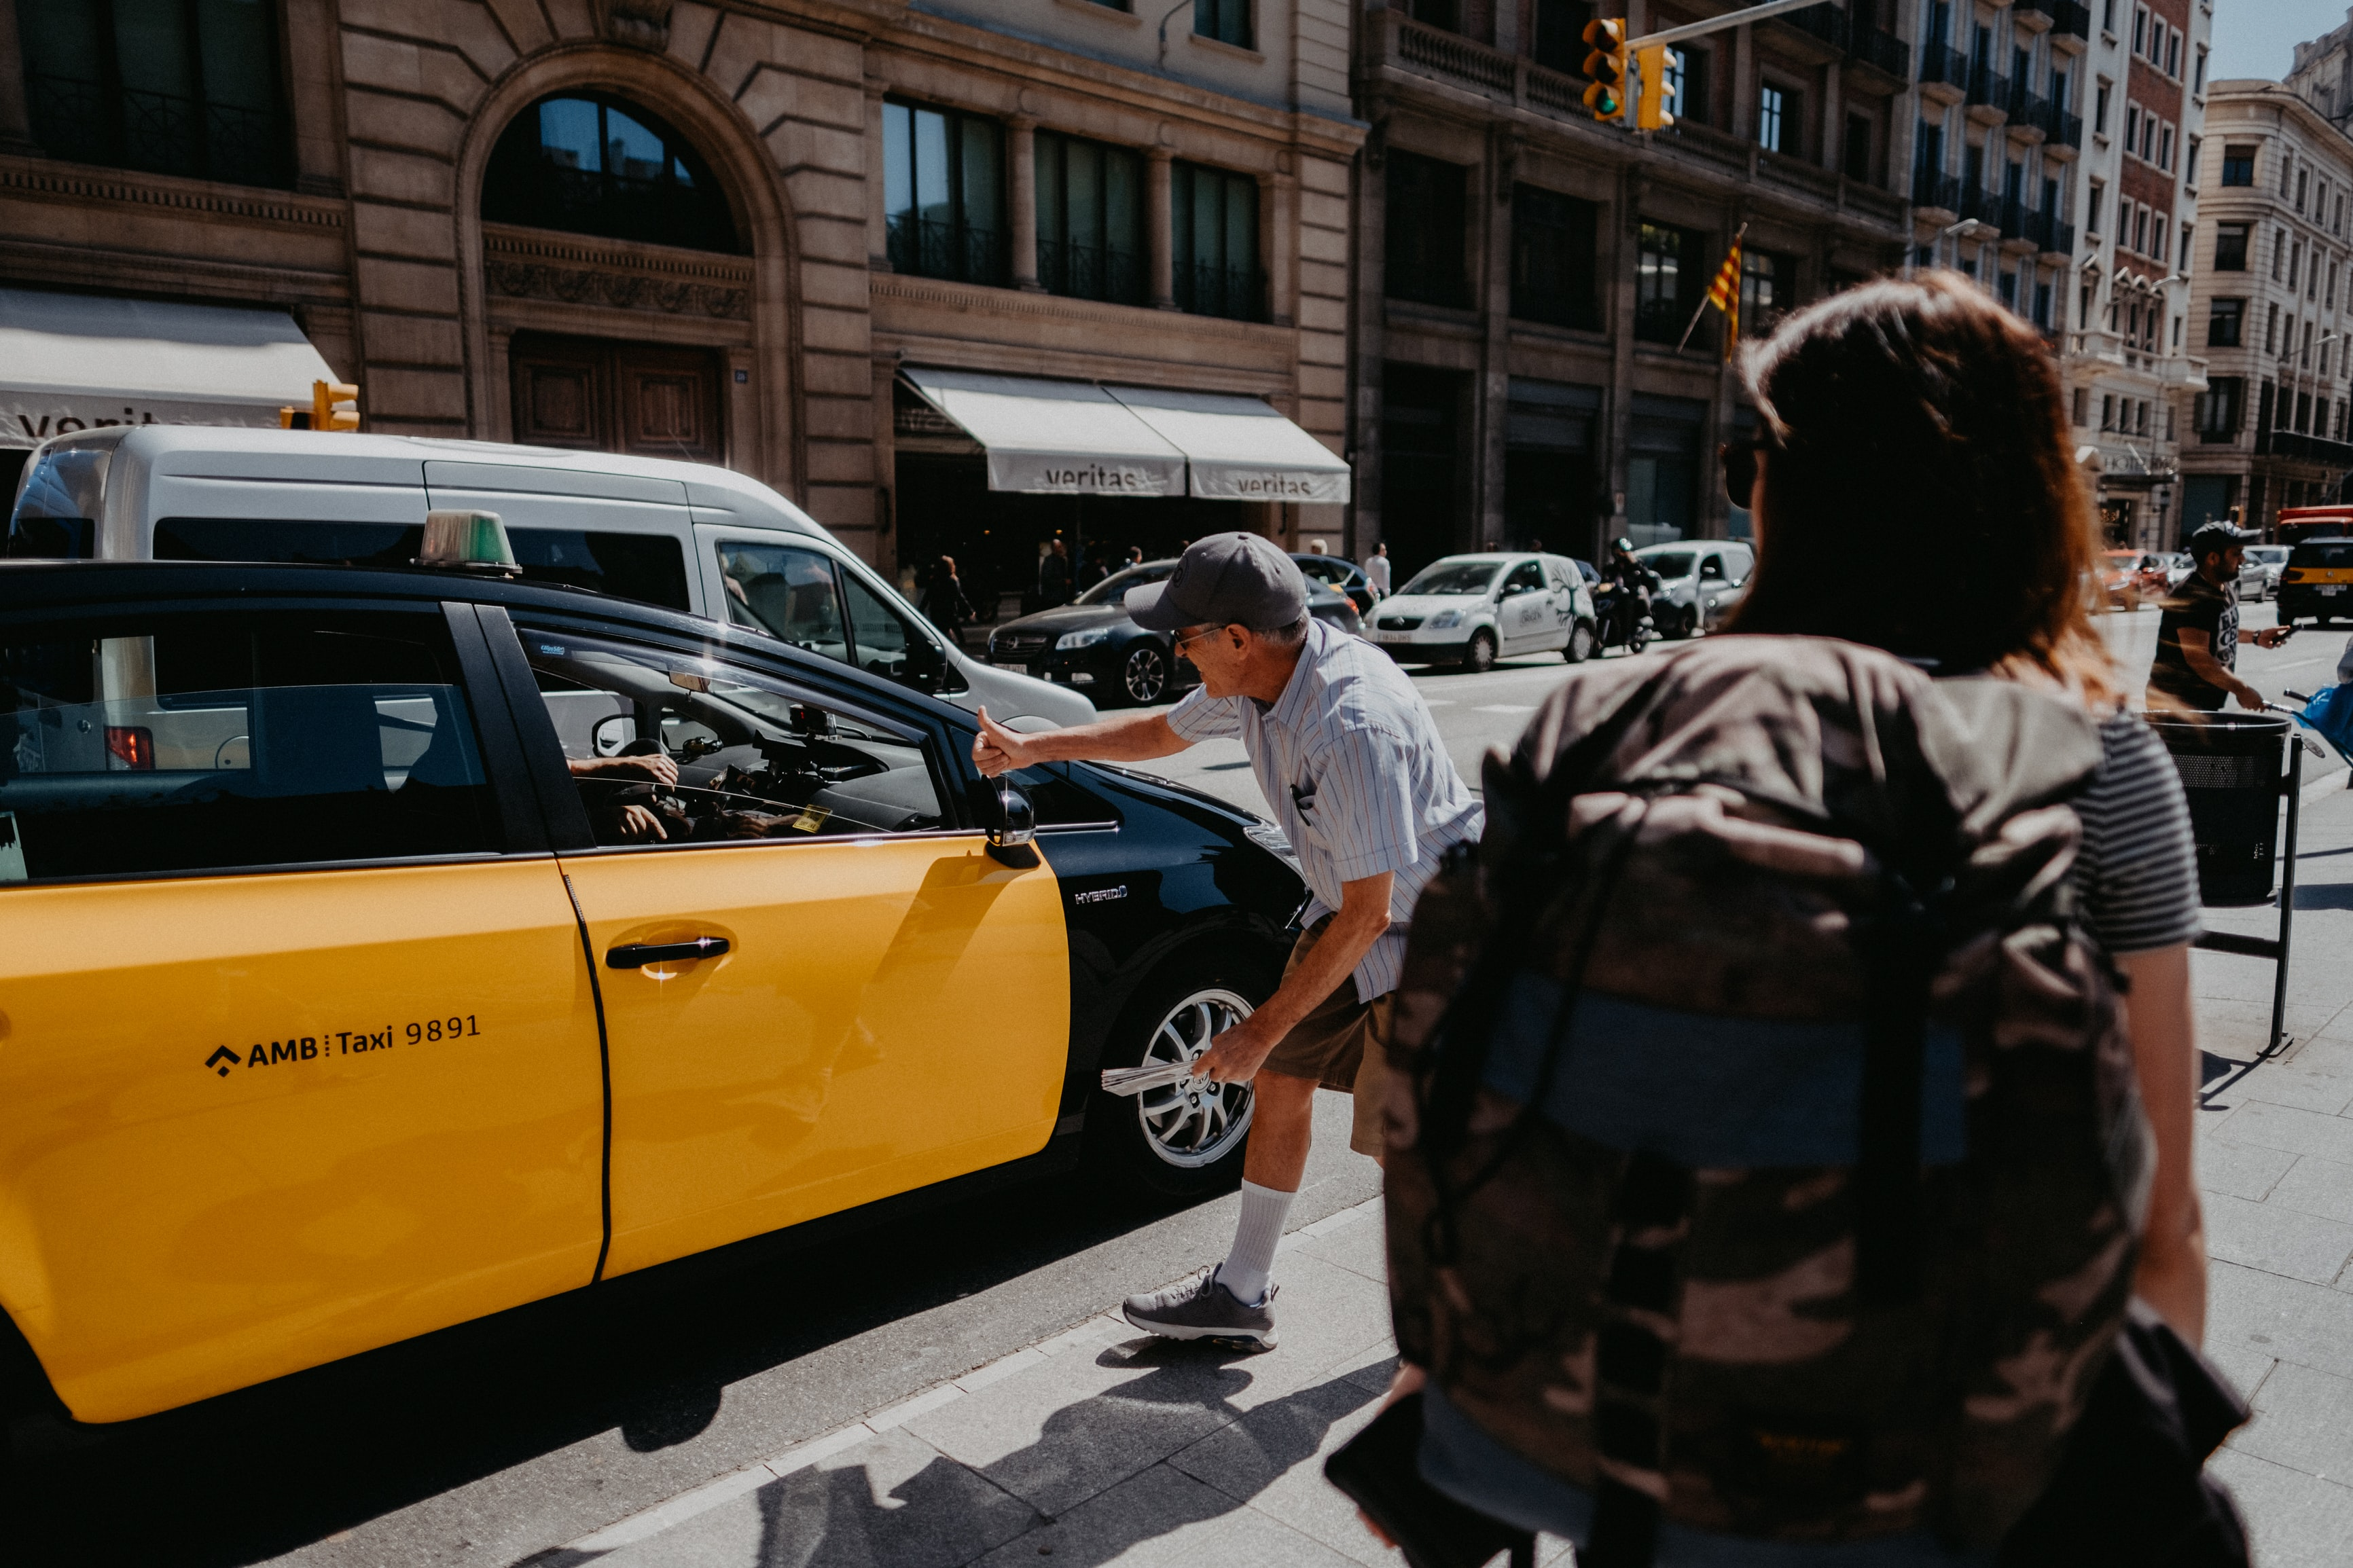 man near yellow and black car